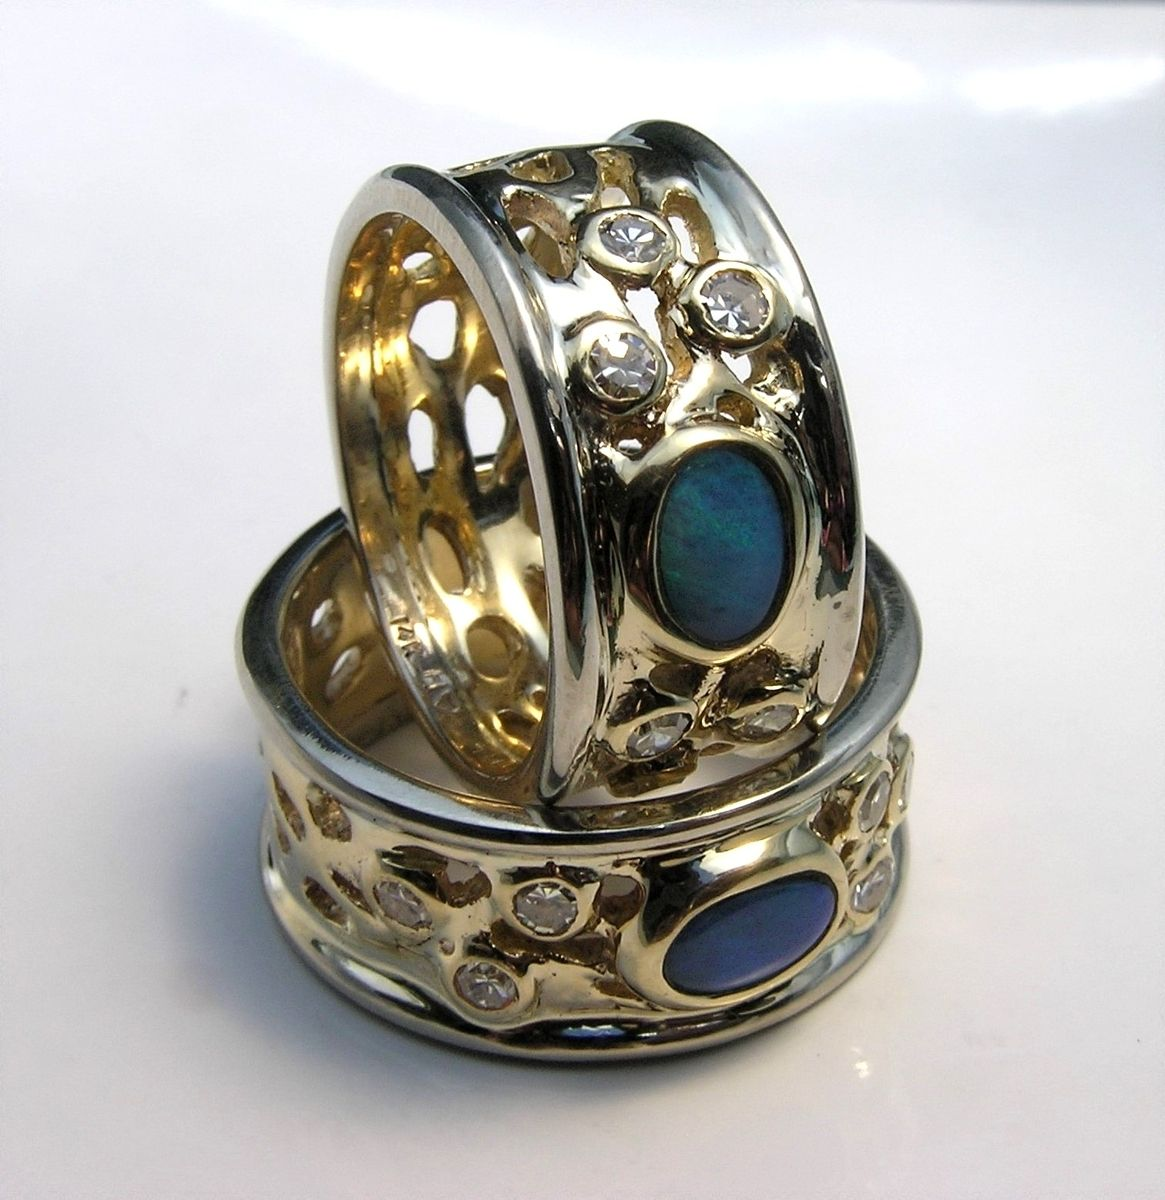 wide band rings with gemstones qf24 advancedmassagebysara. Black Bedroom Furniture Sets. Home Design Ideas